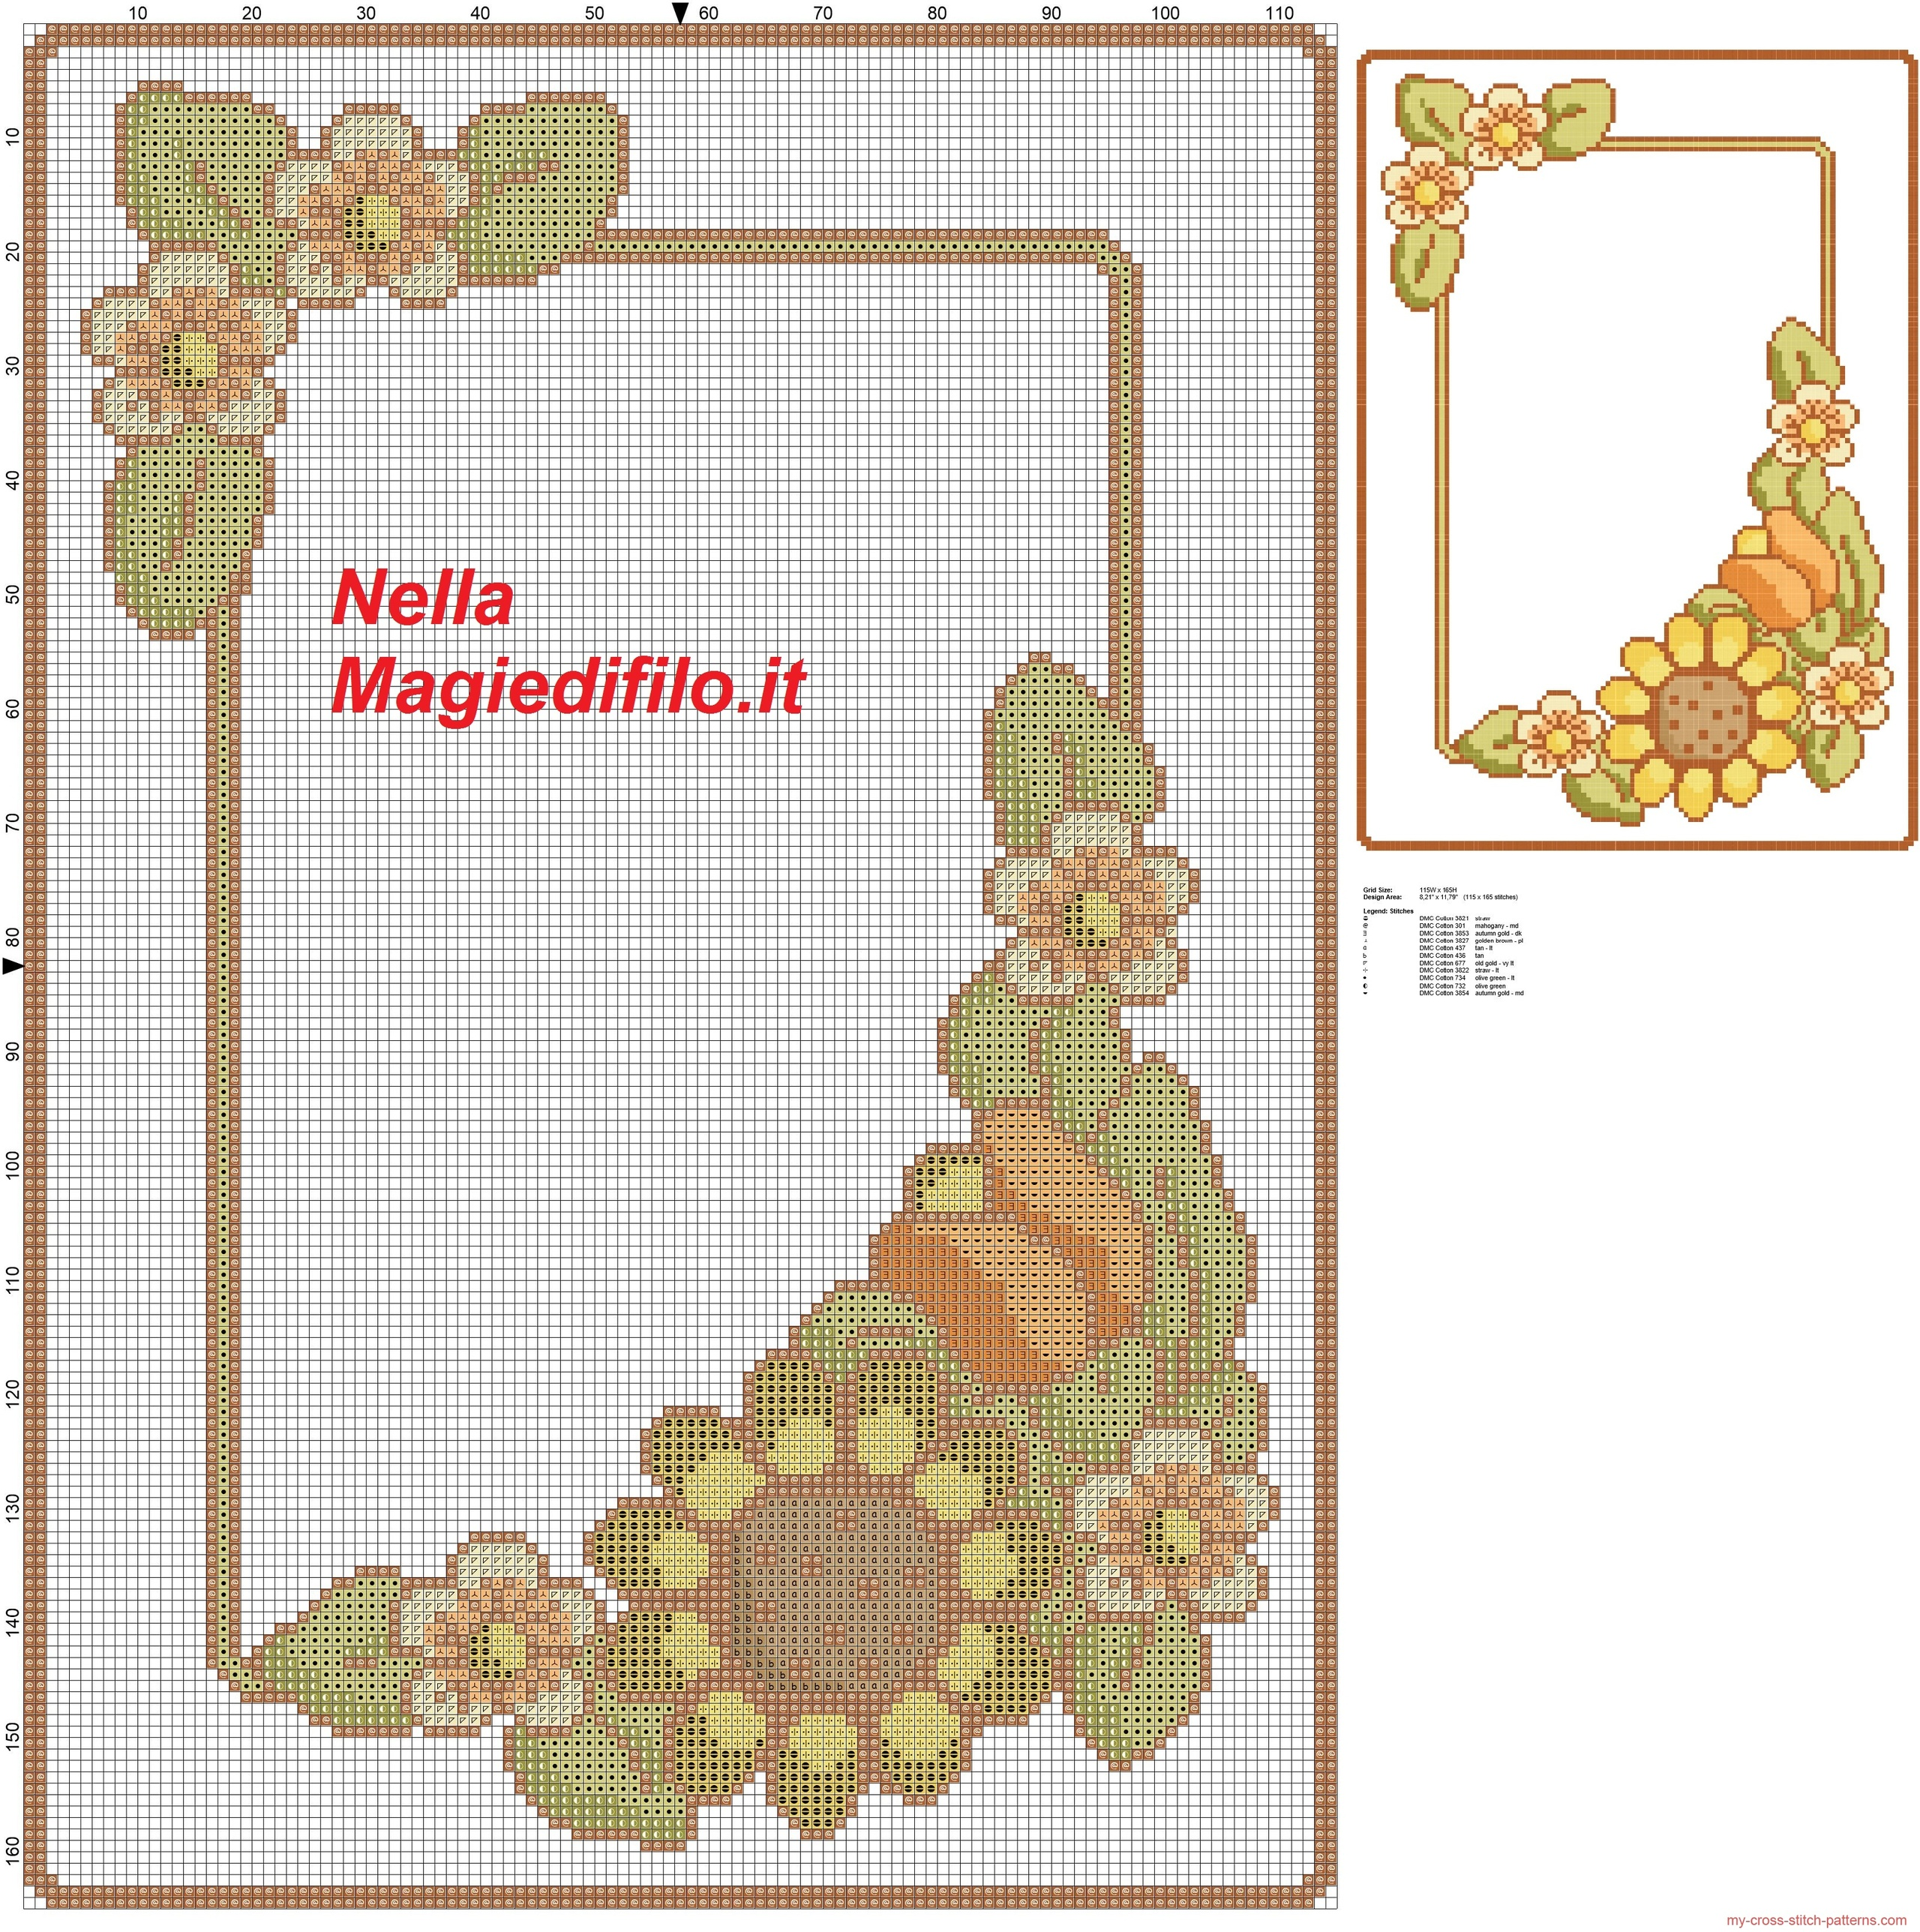 schema_thun_per_vassoio_con_girasole_schema_punto_croce_gratis